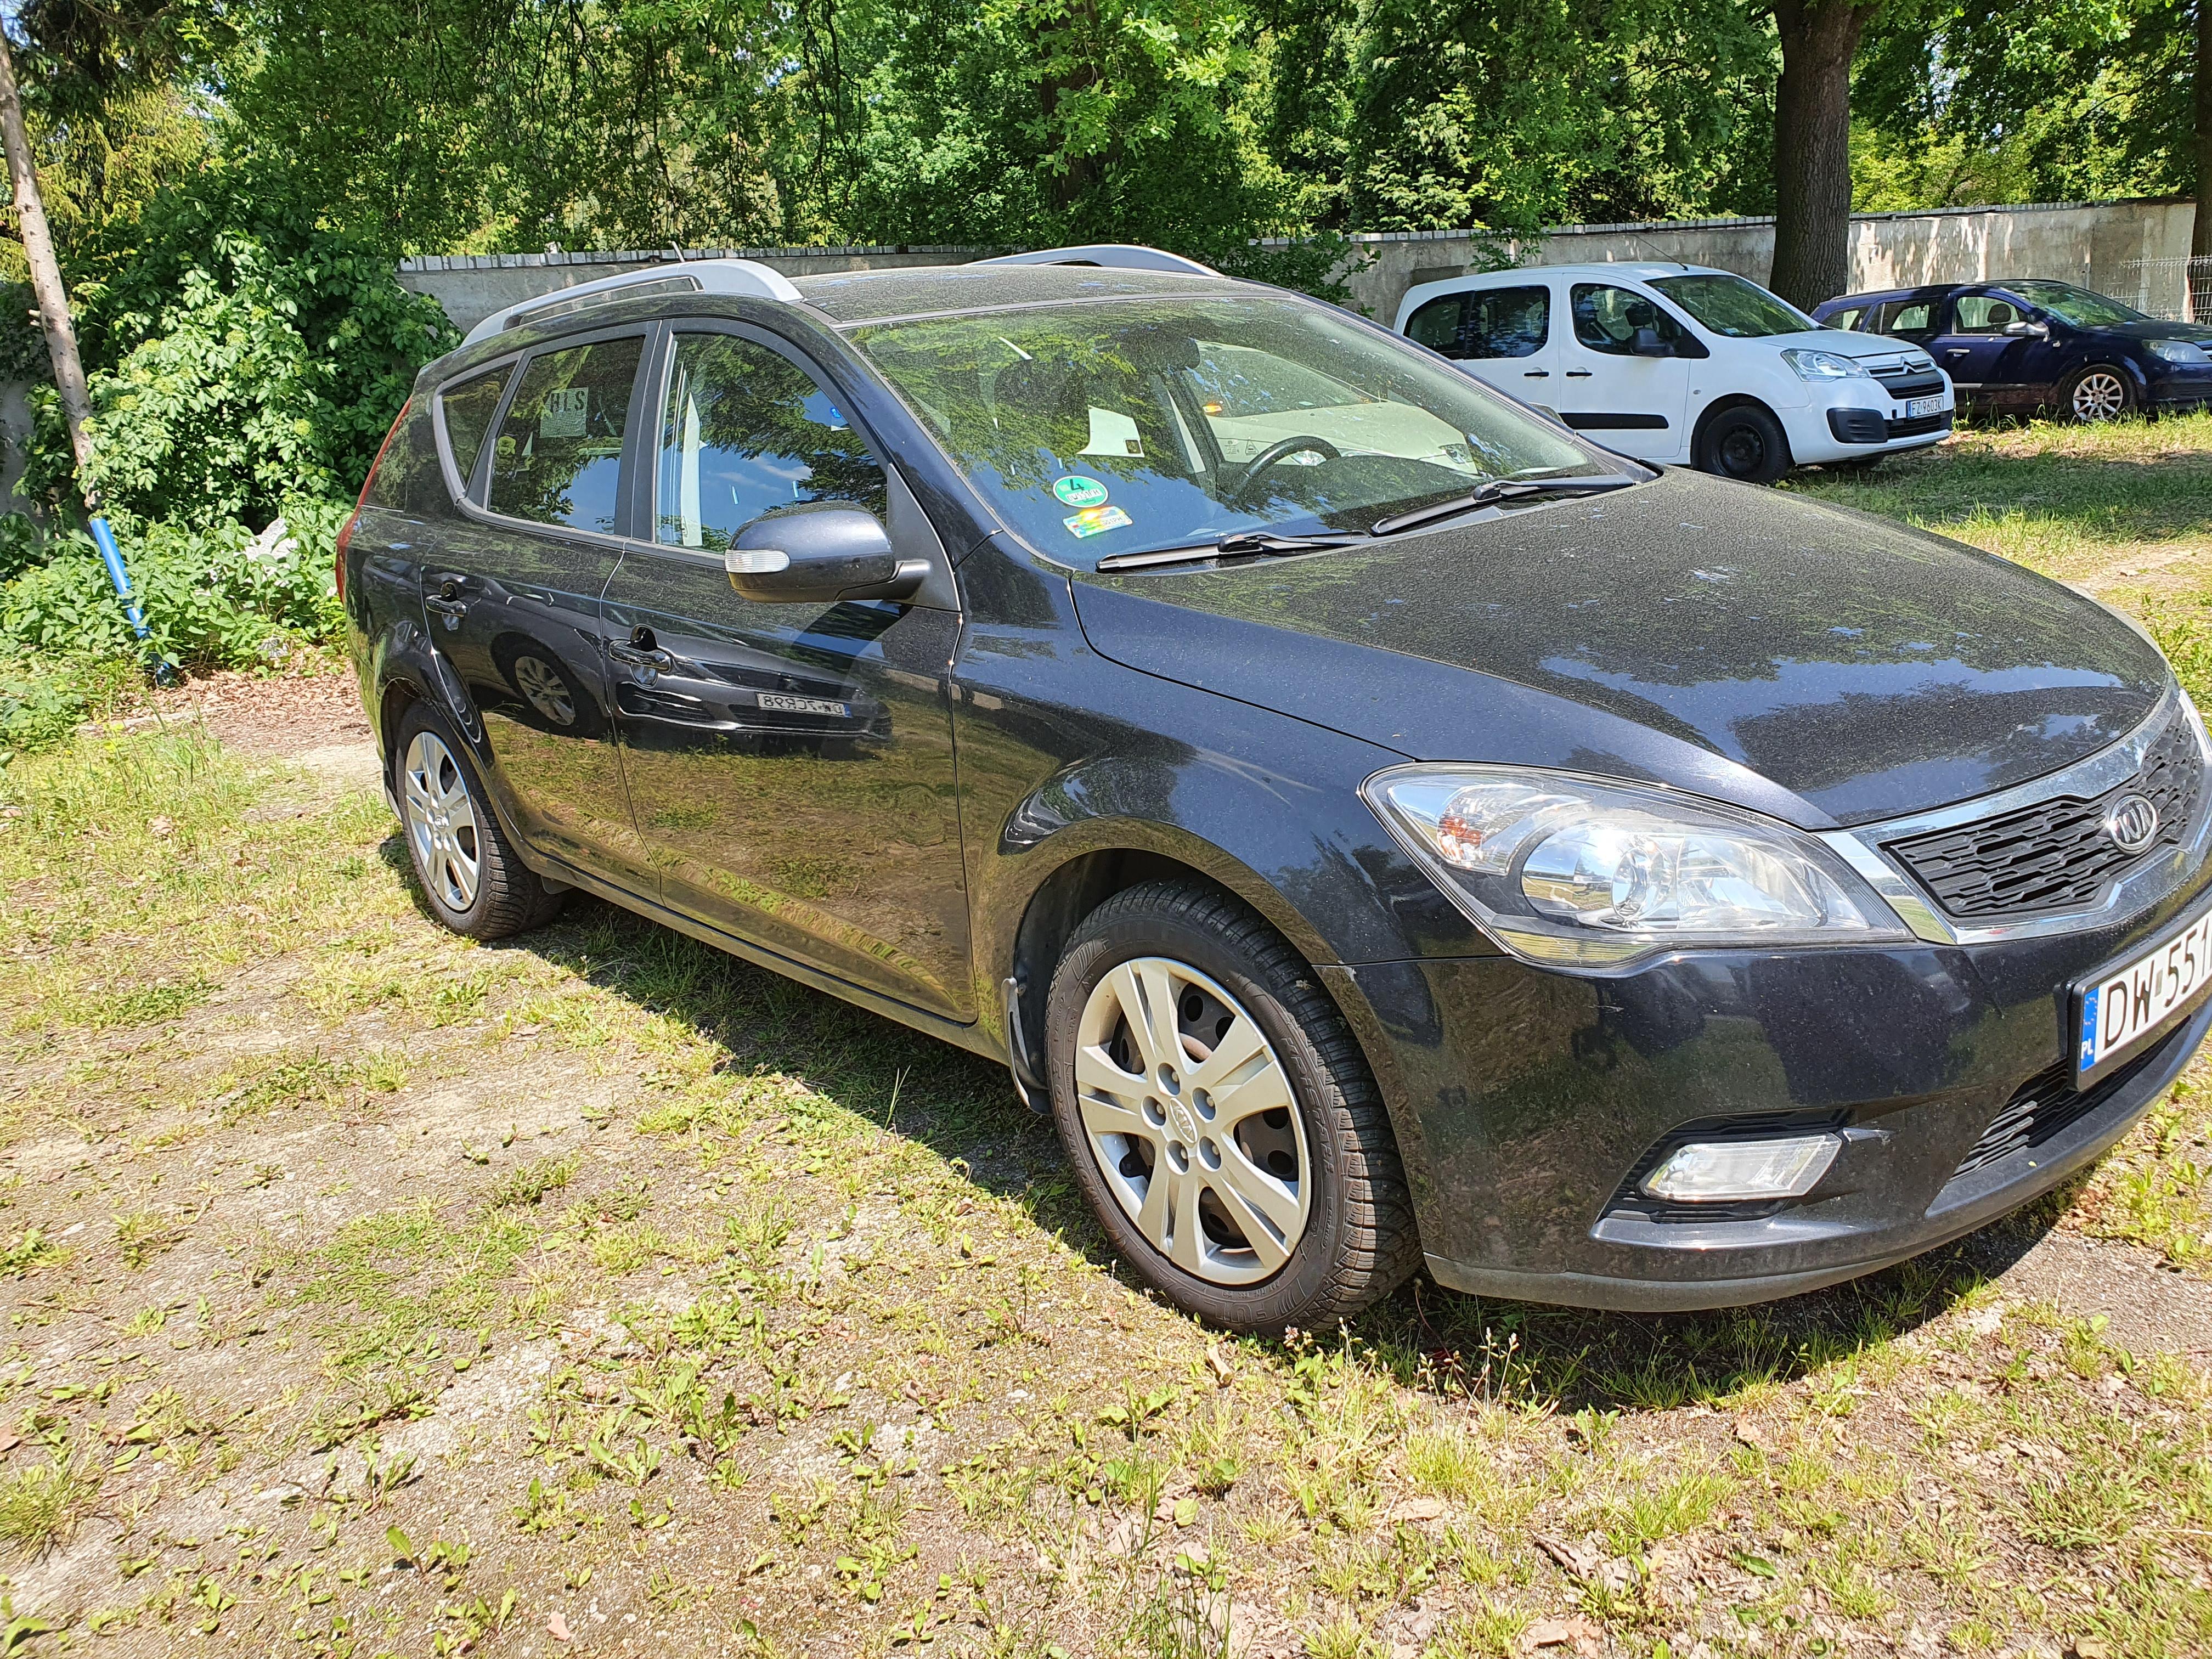 Kia Ceed 1.6 crdi L Sporty Wagon